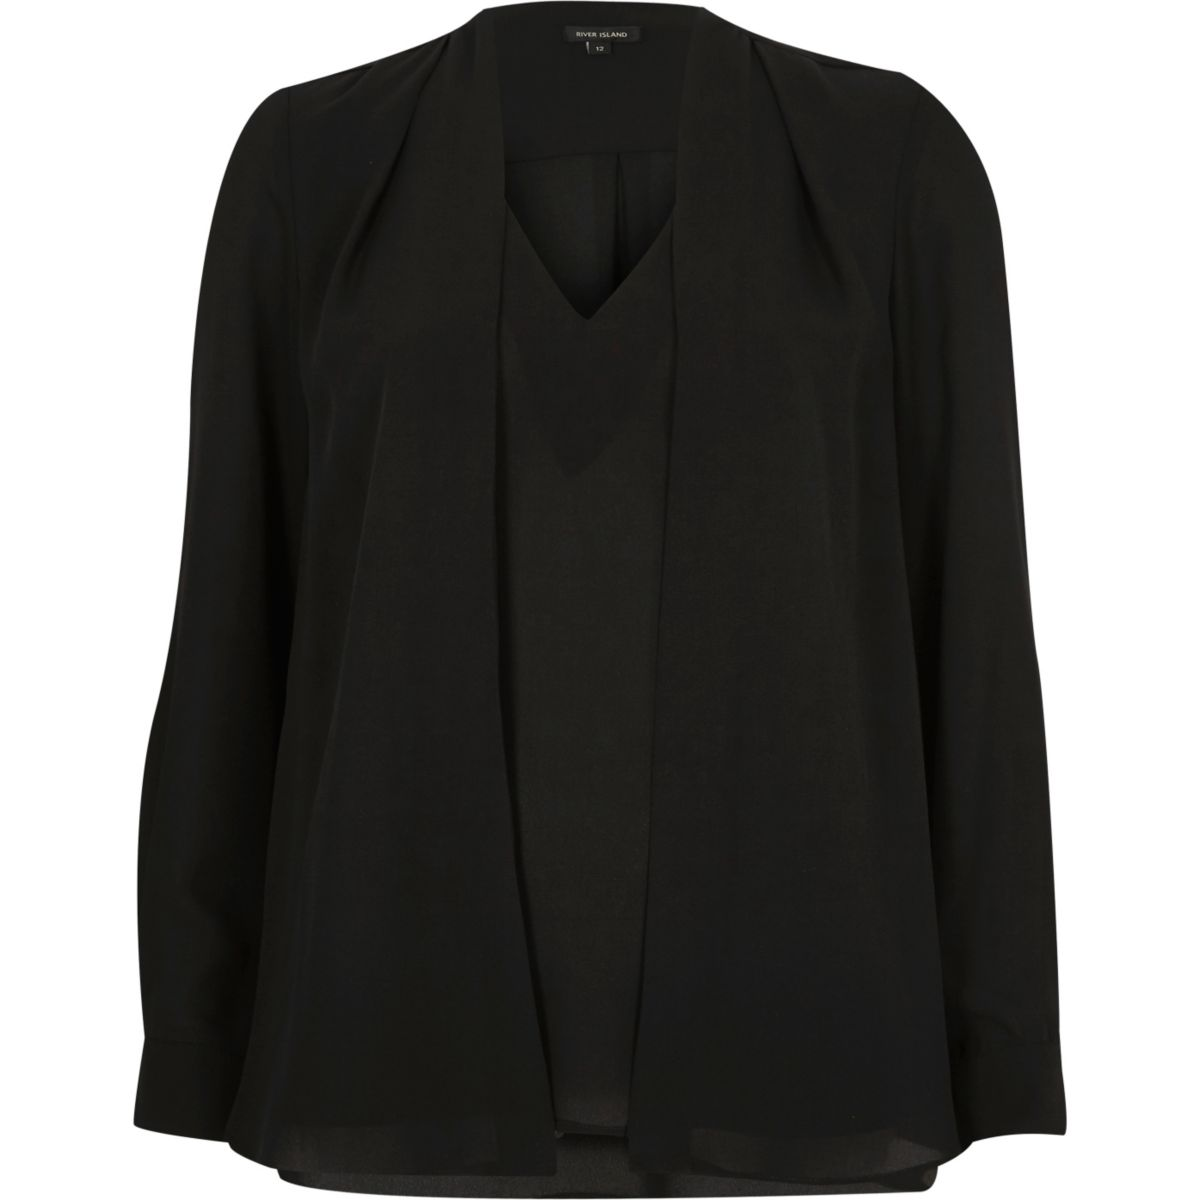 Zwarte 2-in-1 blouse